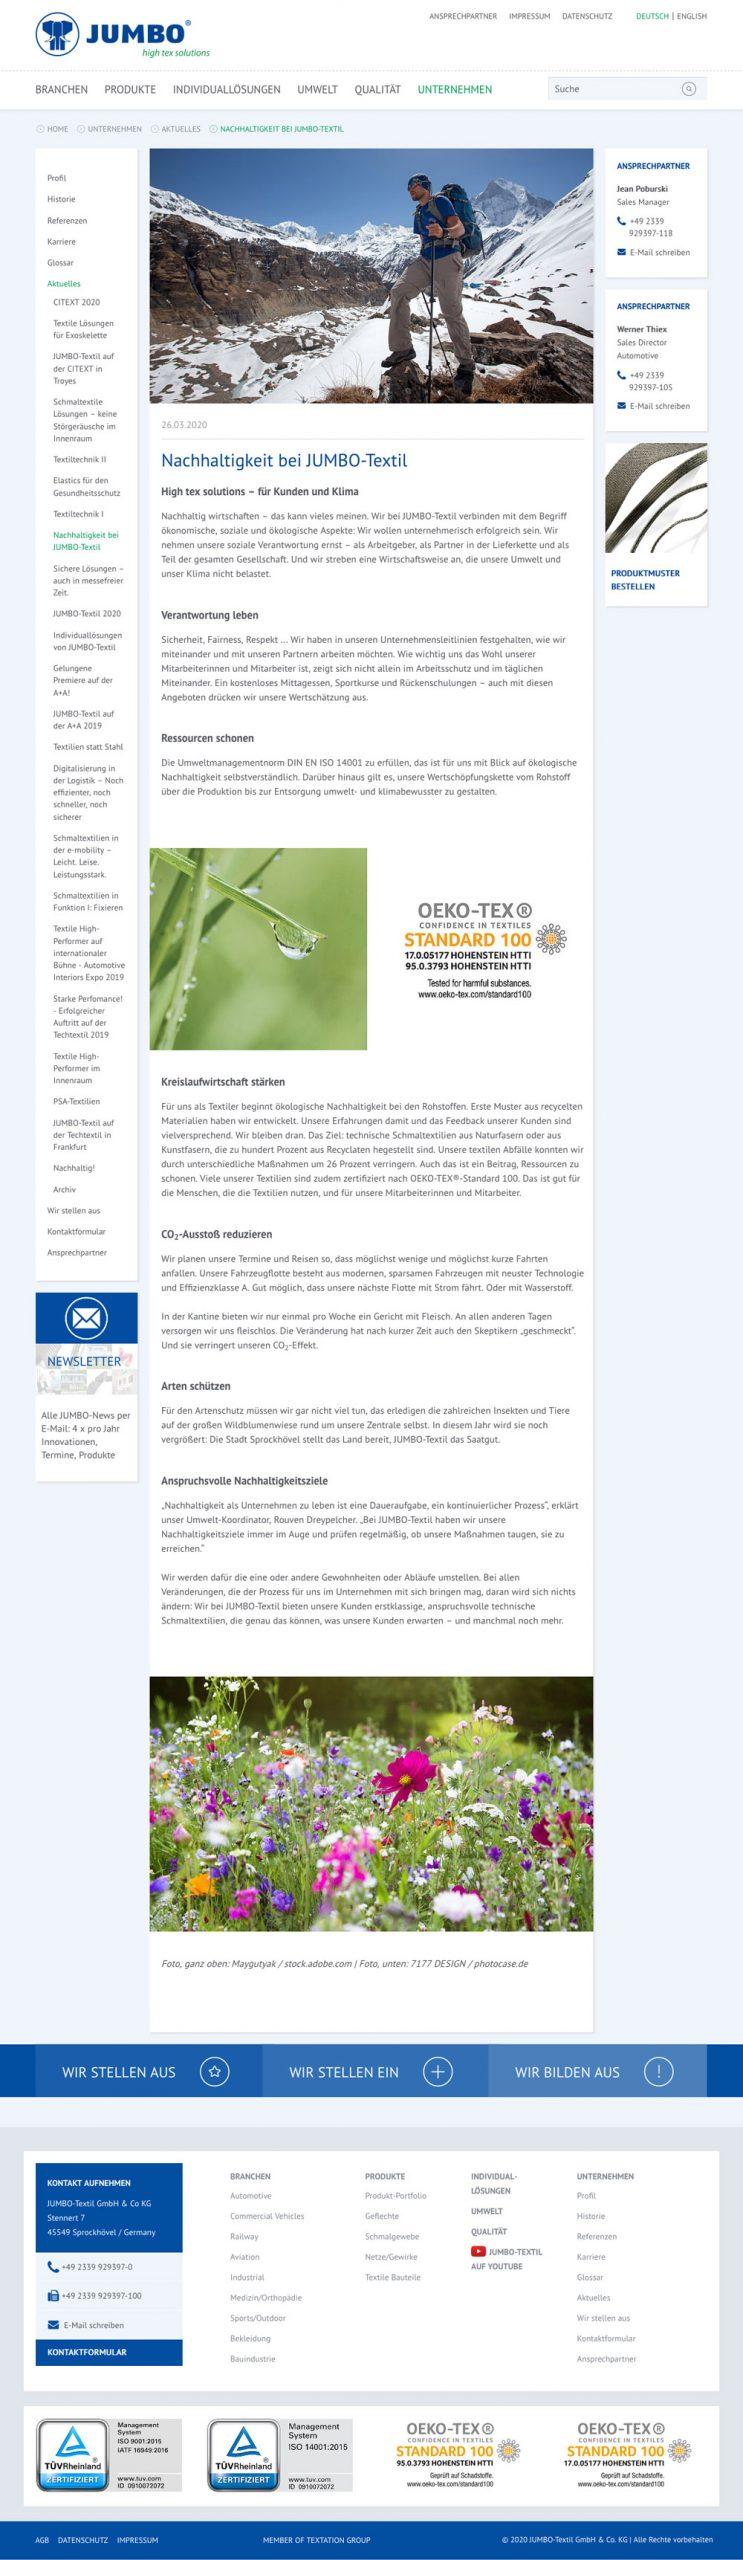 stotz Digital-Design JUMBO-Textil Nachhaltigkeit